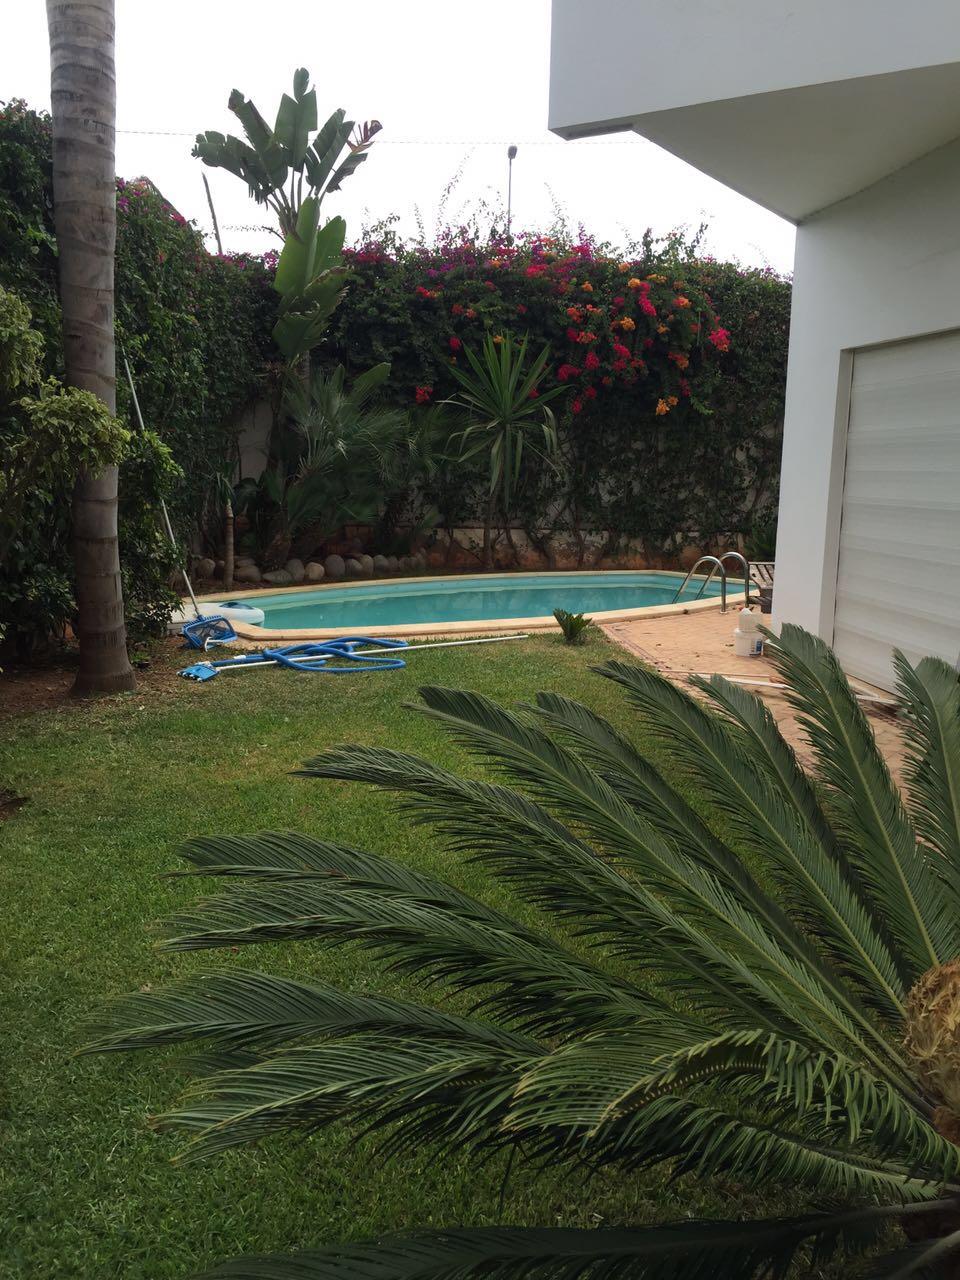 Villa 580 m² à vendre, ain diab, casablanca